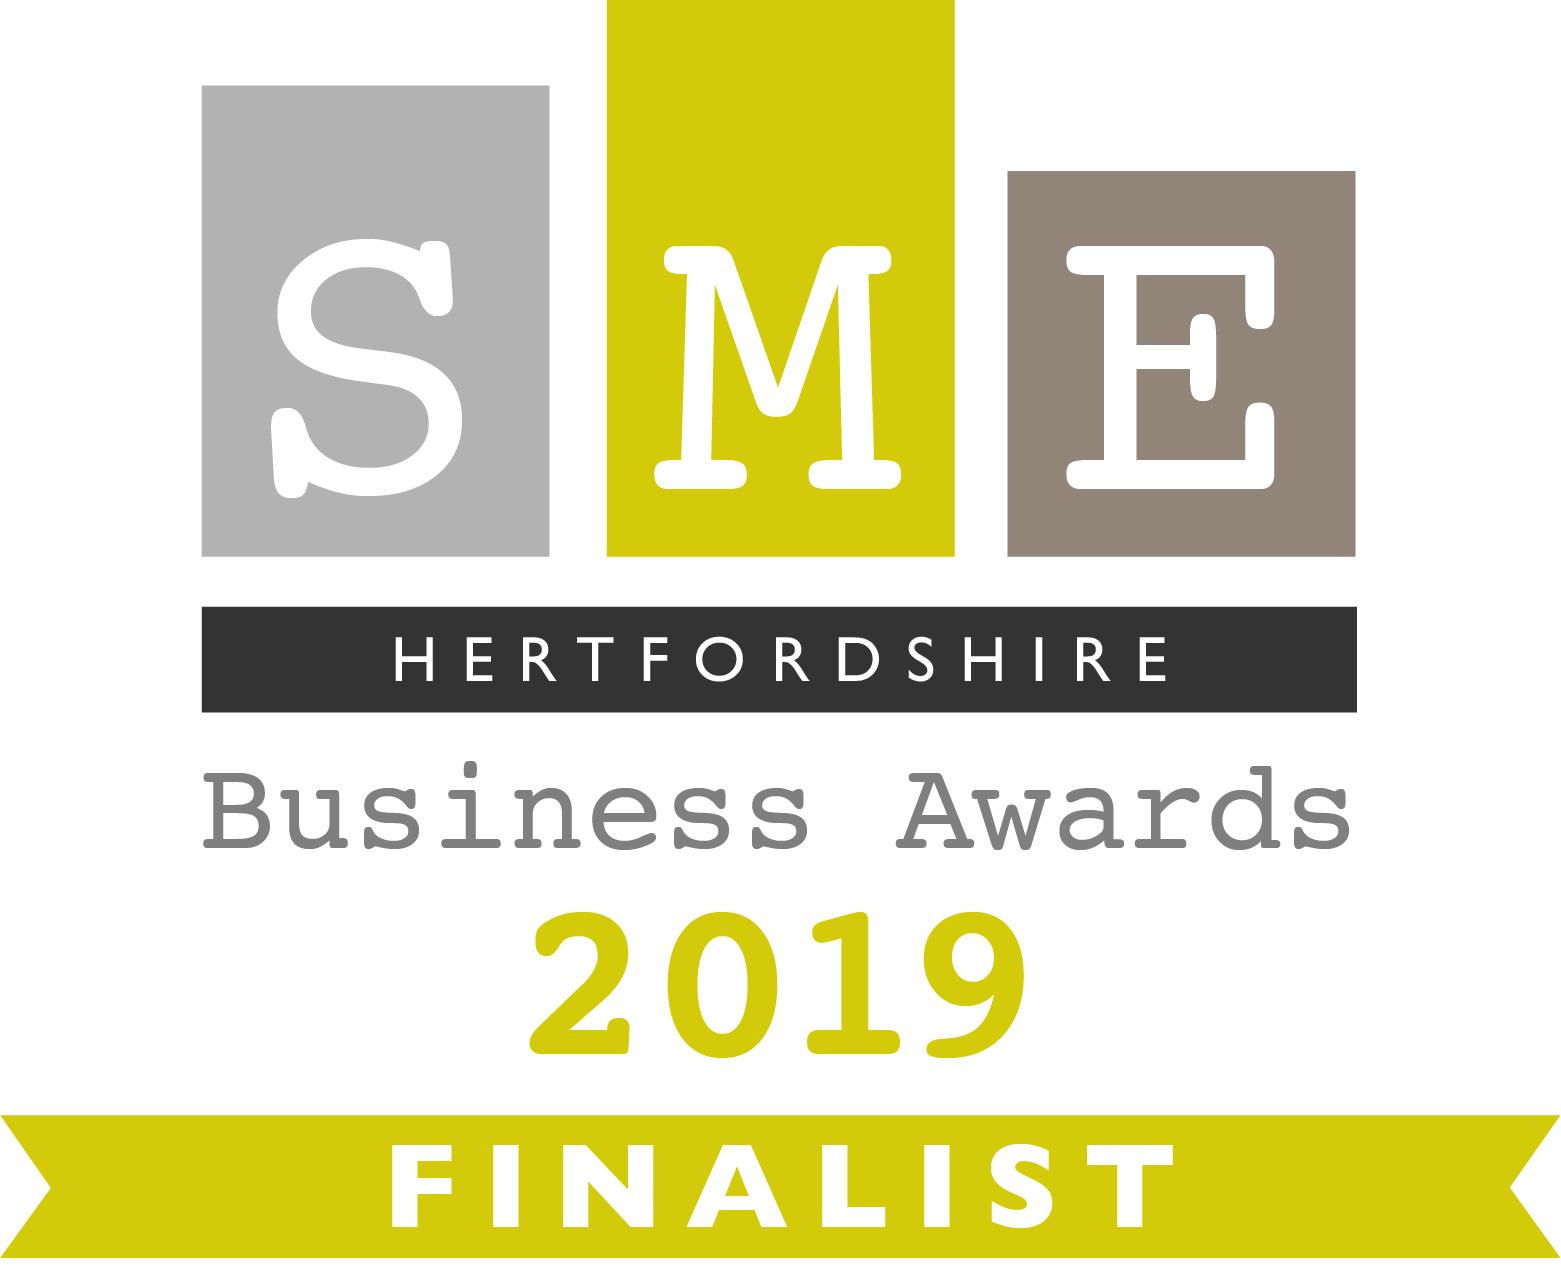 SME Herts Business Award_Finalist_2019.jpg